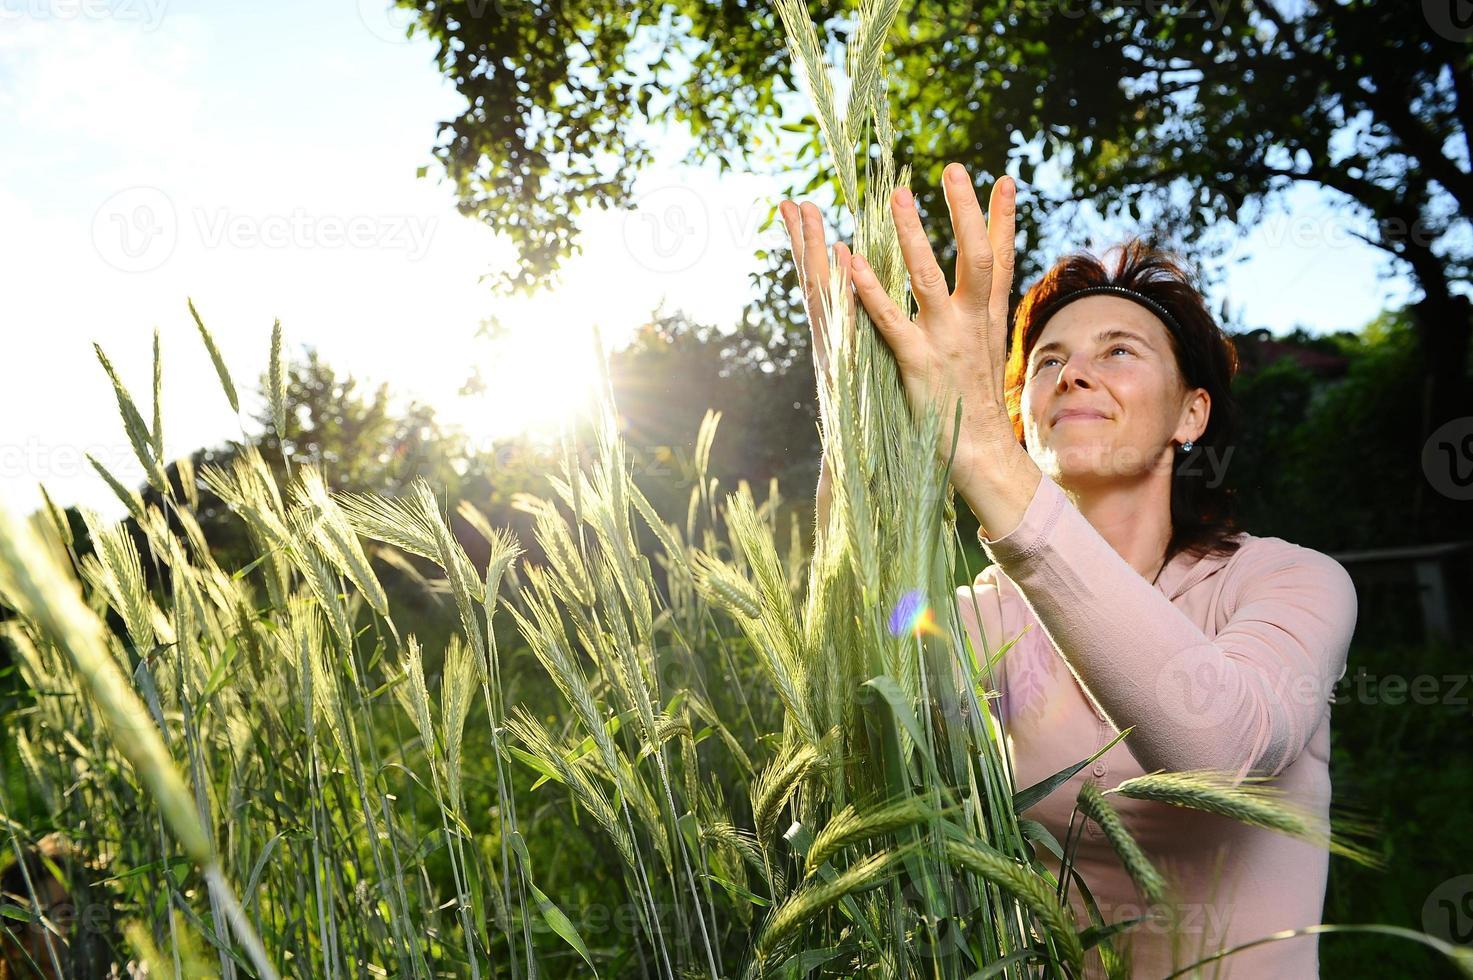 Girl tenderly embraces sheaf of wheat photo